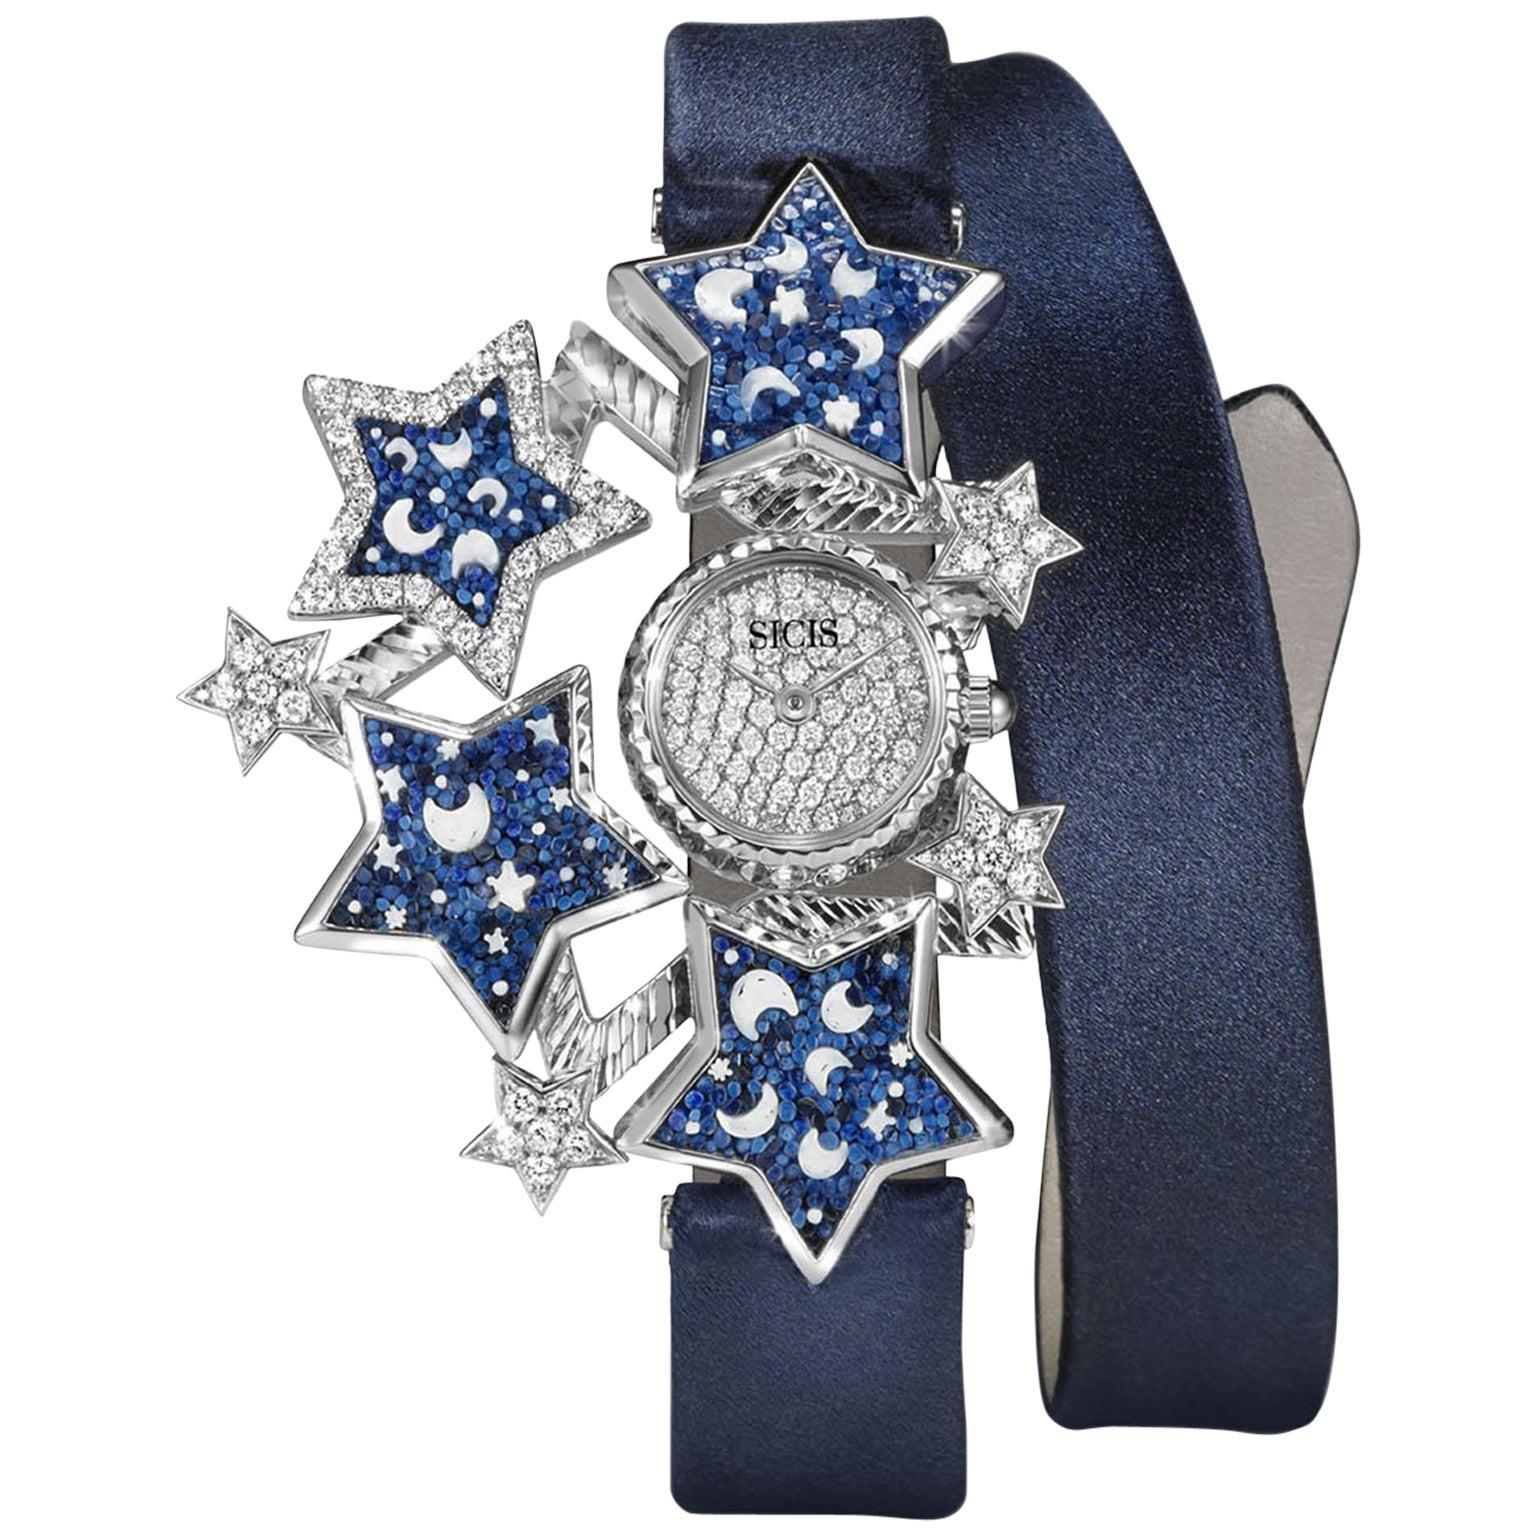 Stylish Wristwatch White Gold White Diamonds Silk strap Quartz movement